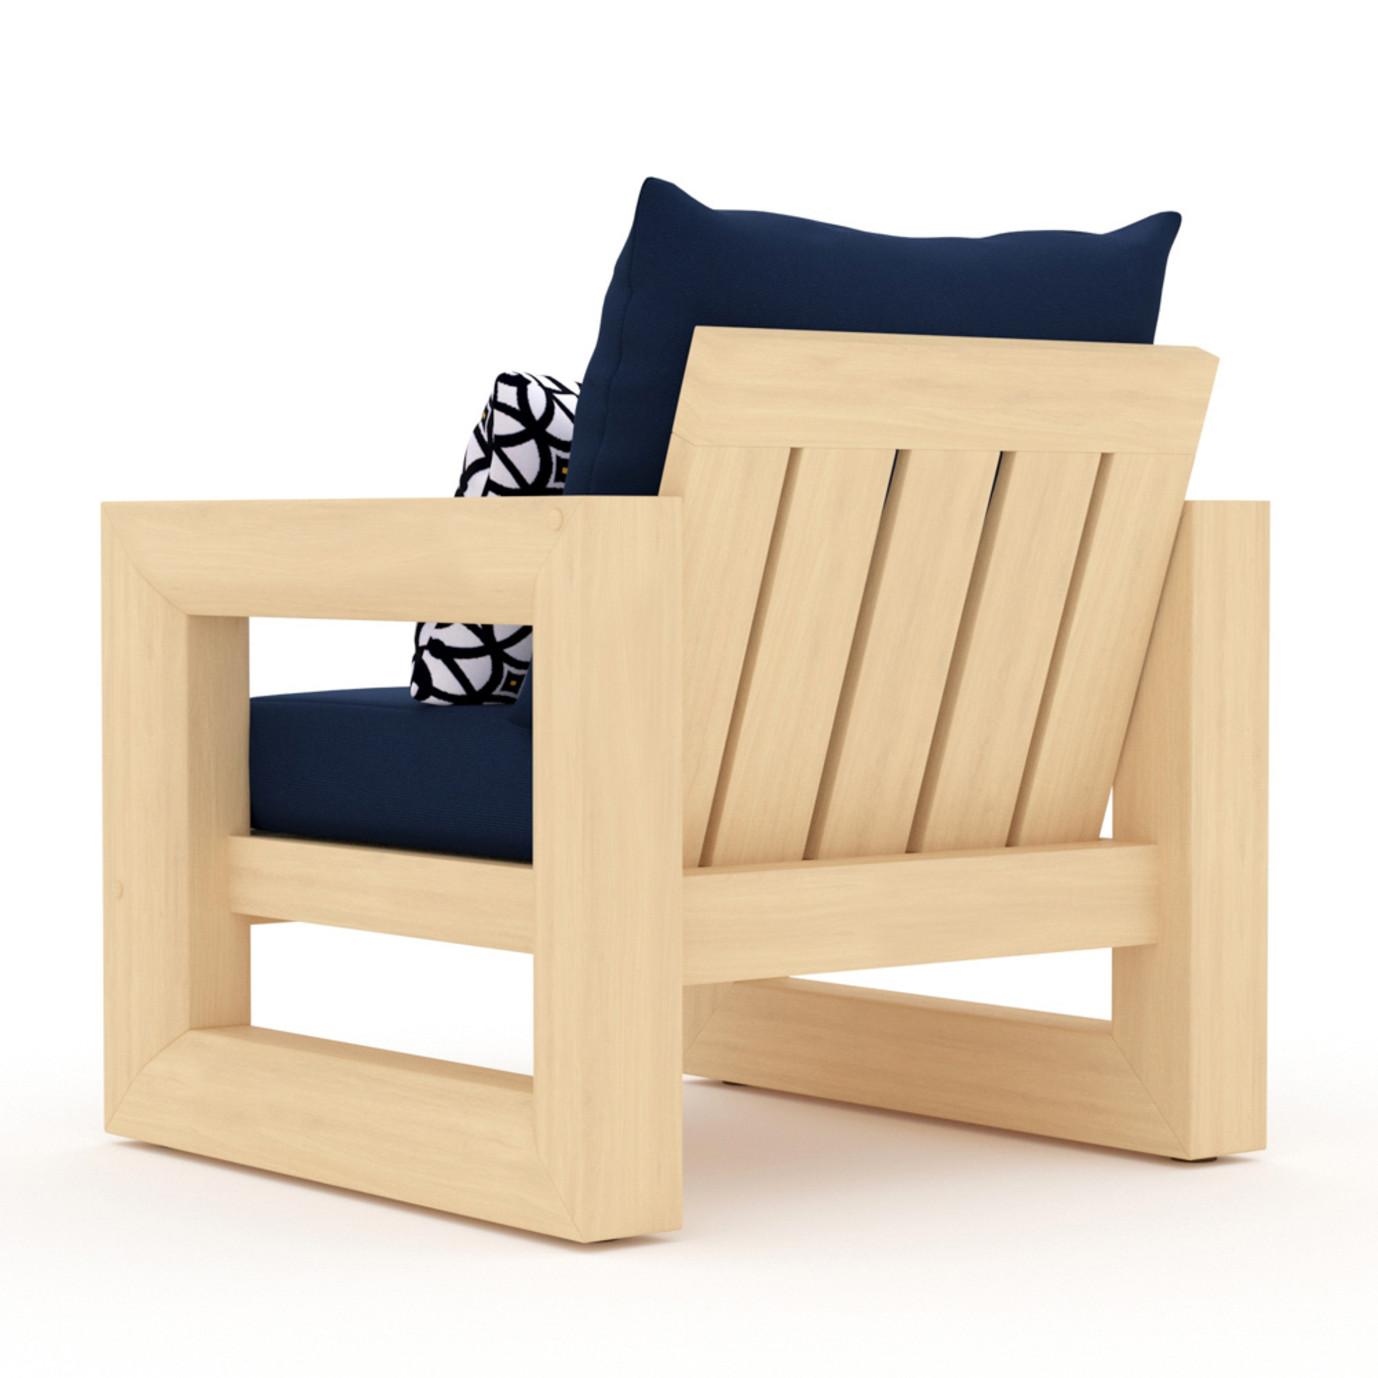 Benson Club Chairs - Navy Blue